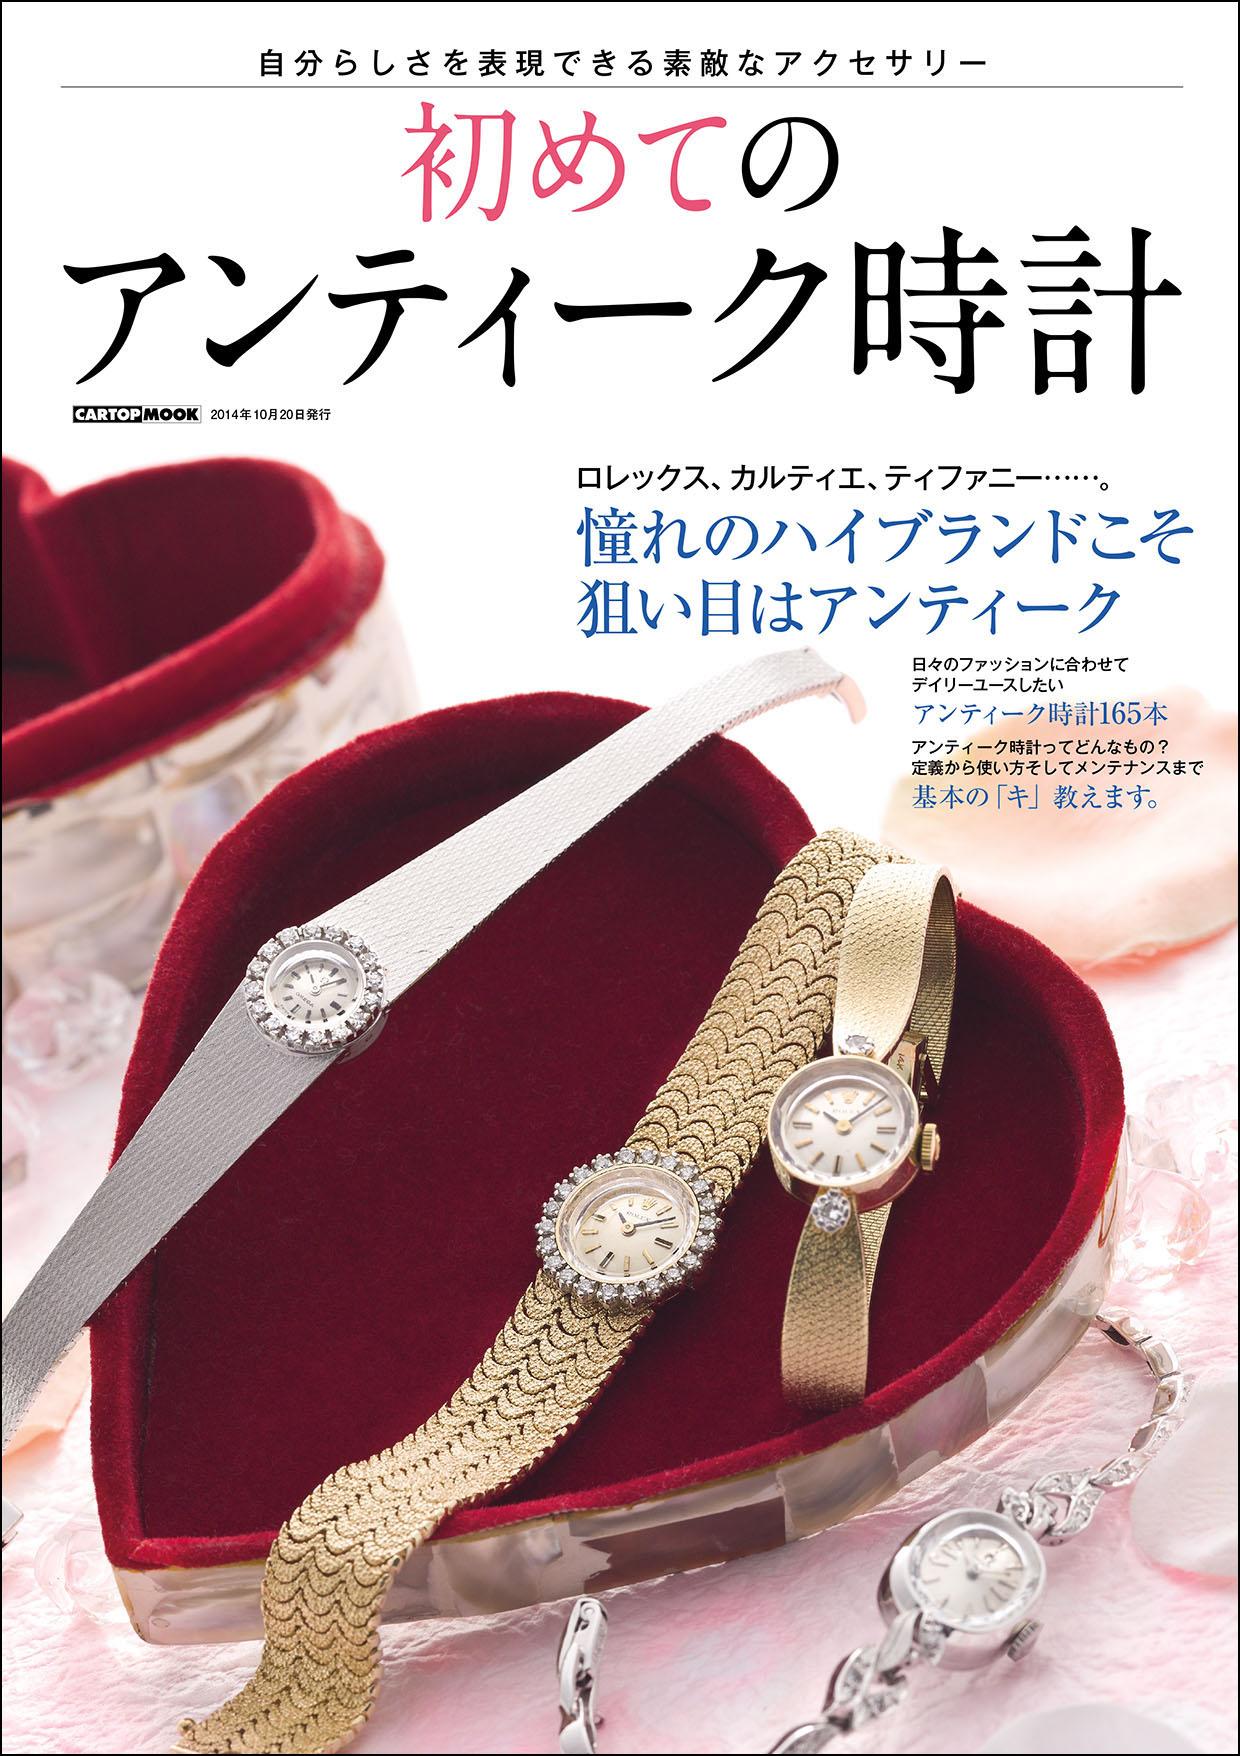 newest cdf3e 8e6ac 初めてのアンティーク時計」発売 | 株式会社シーズ ...